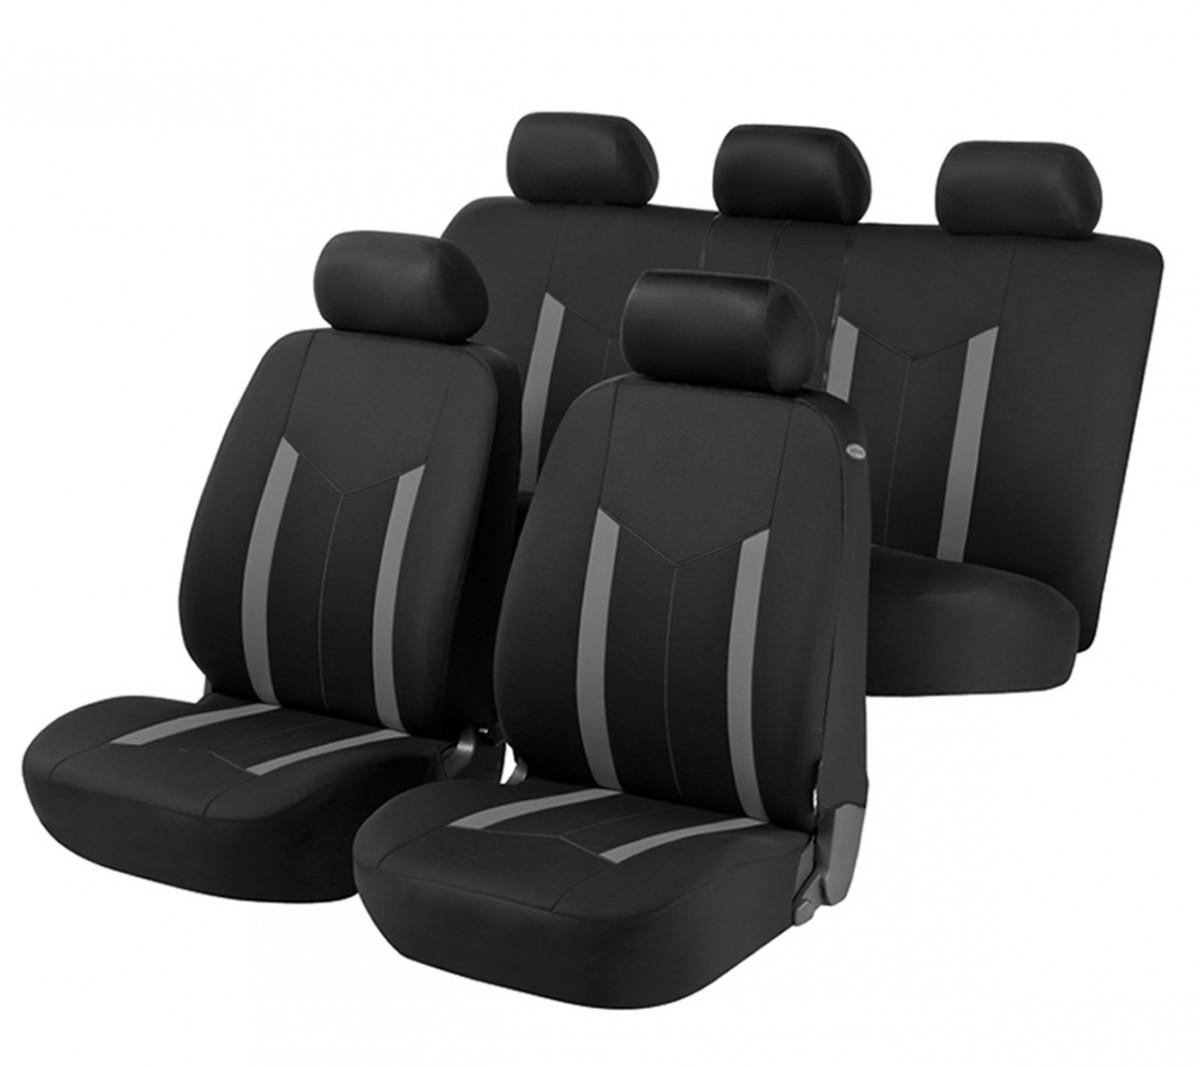 Sitzbezüge Schonbezüge SET GD Citroen Jumper Kunstleder grau